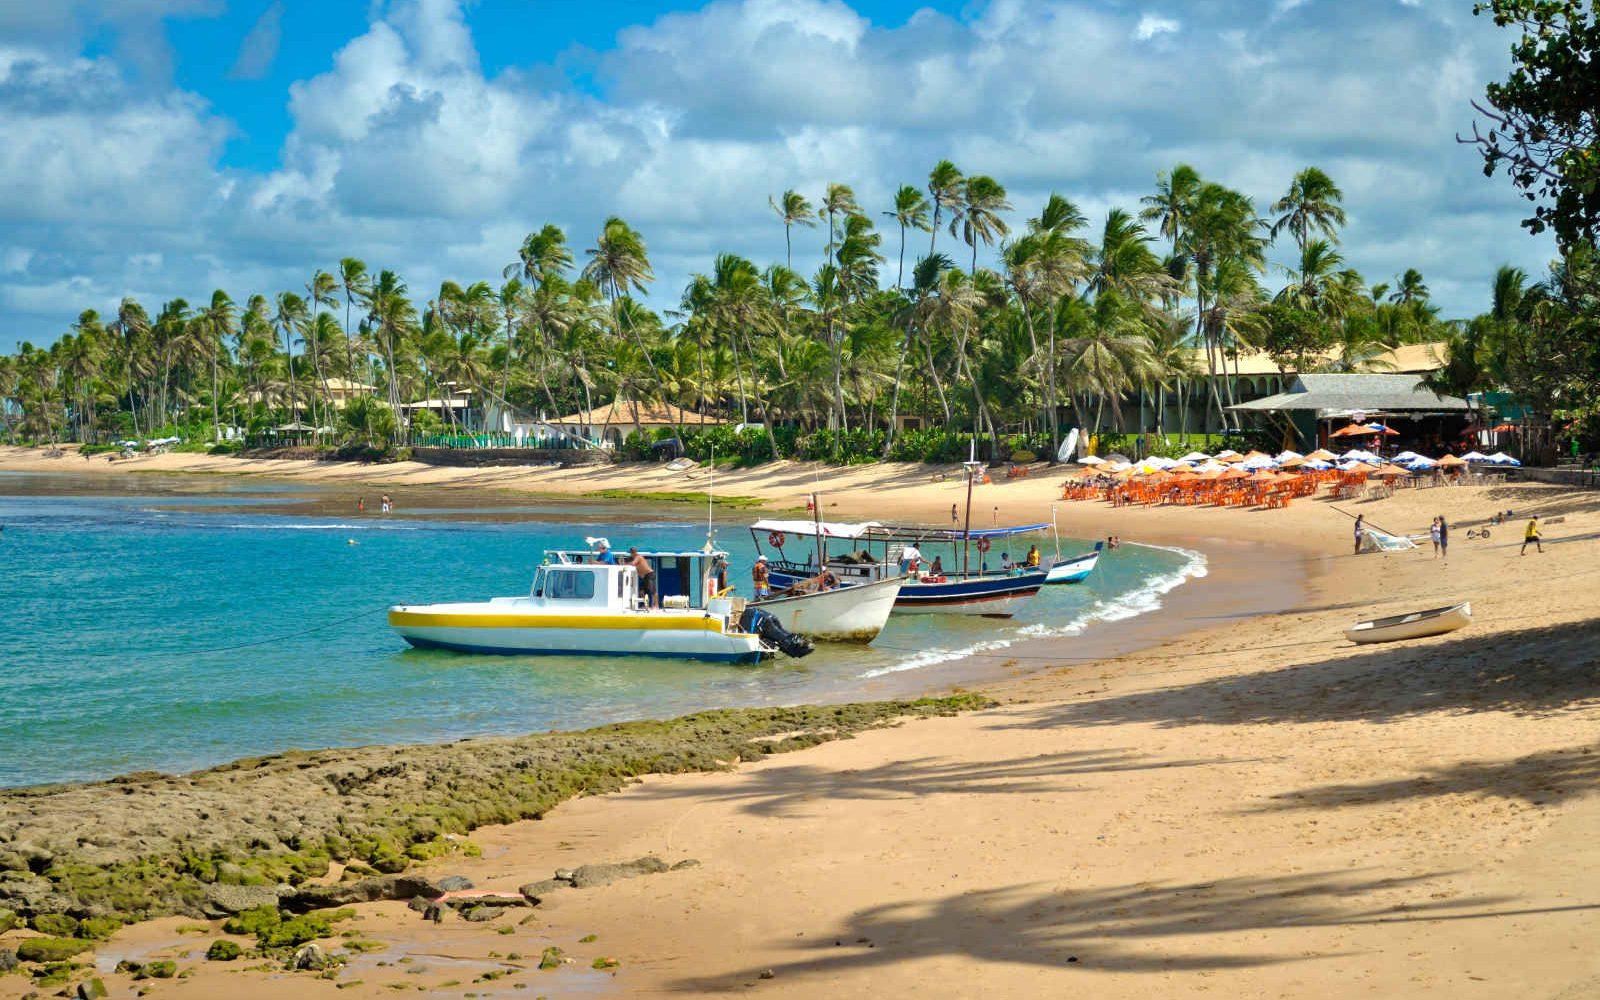 Praia do Forte, Bahia, Brésil